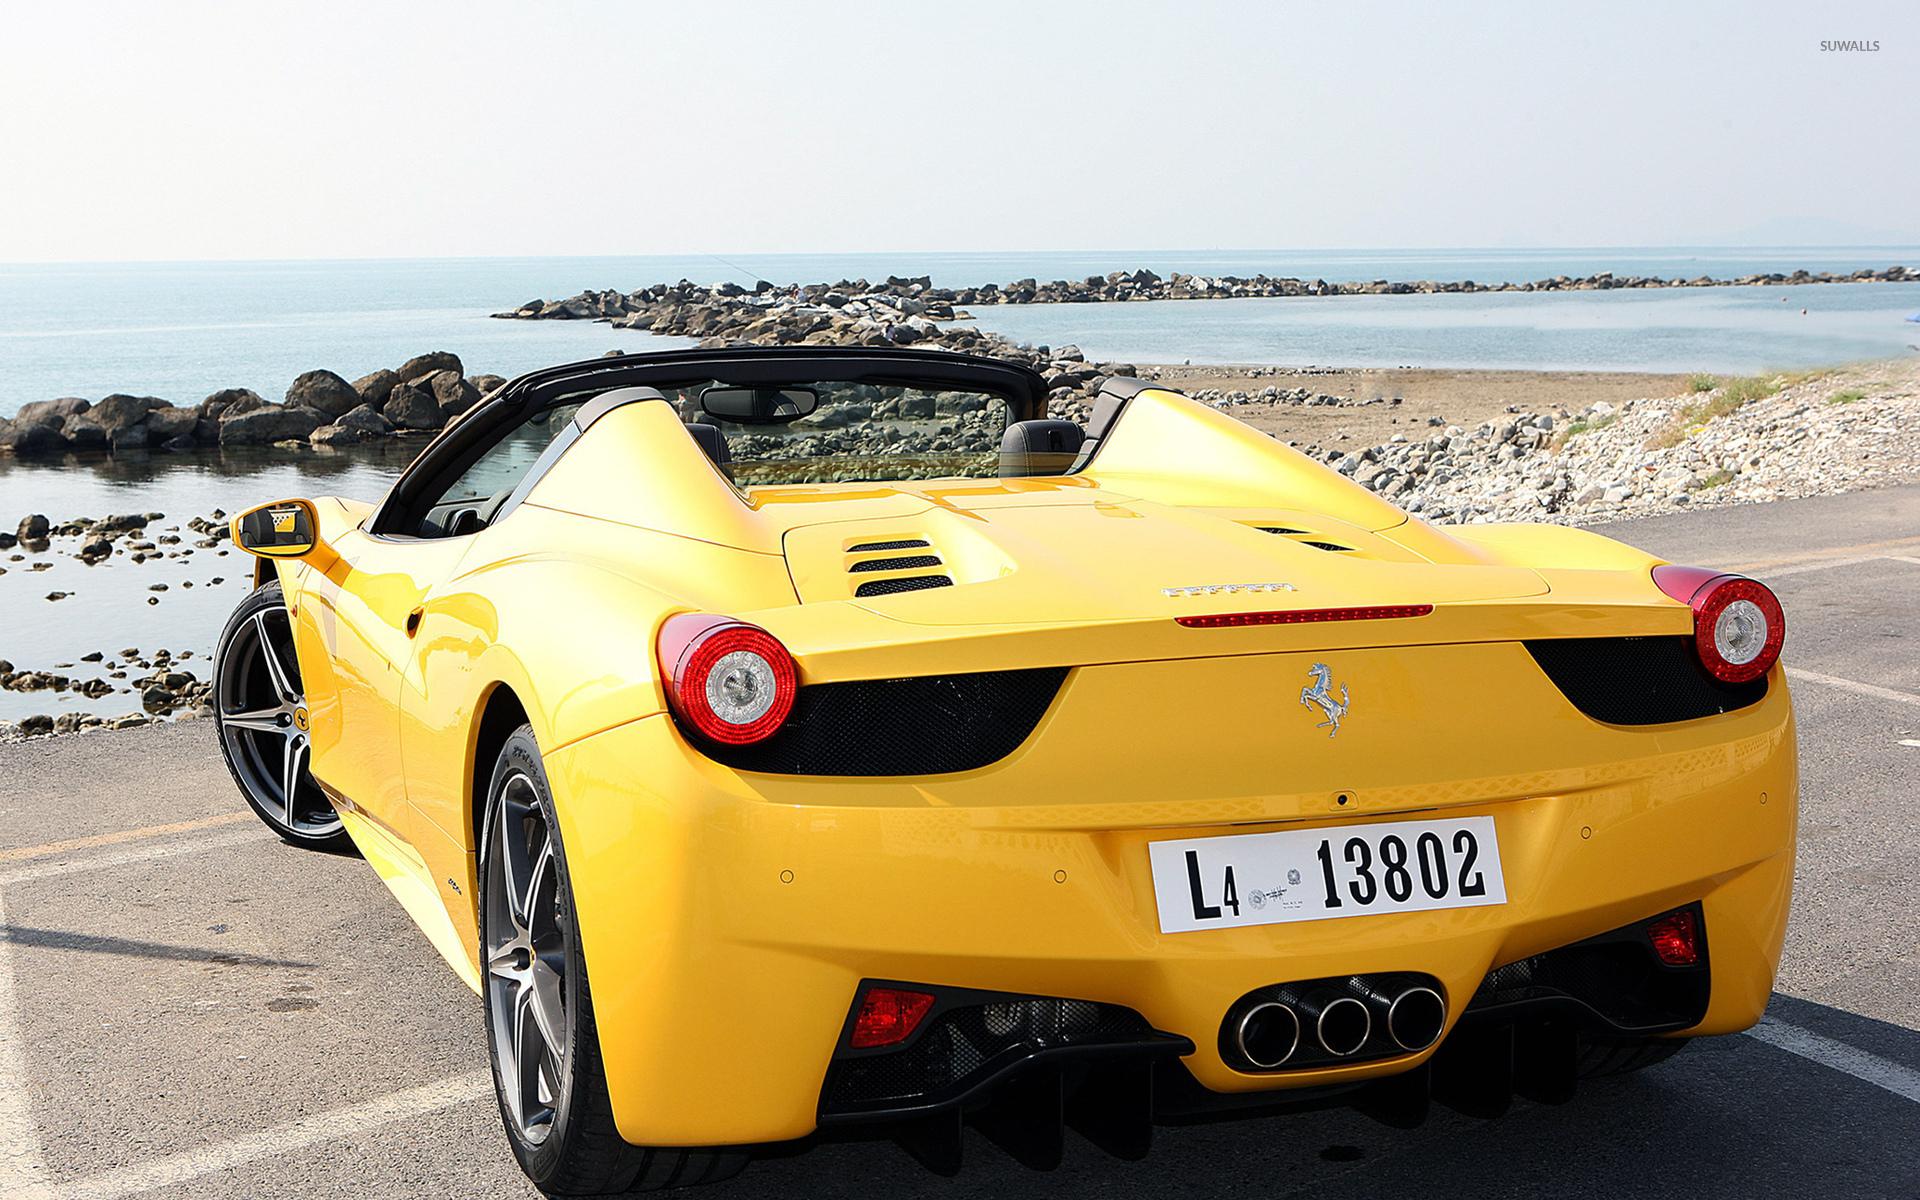 Yellow Ferrari 458 Spider Back View Wallpaper Car Wallpapers 51679